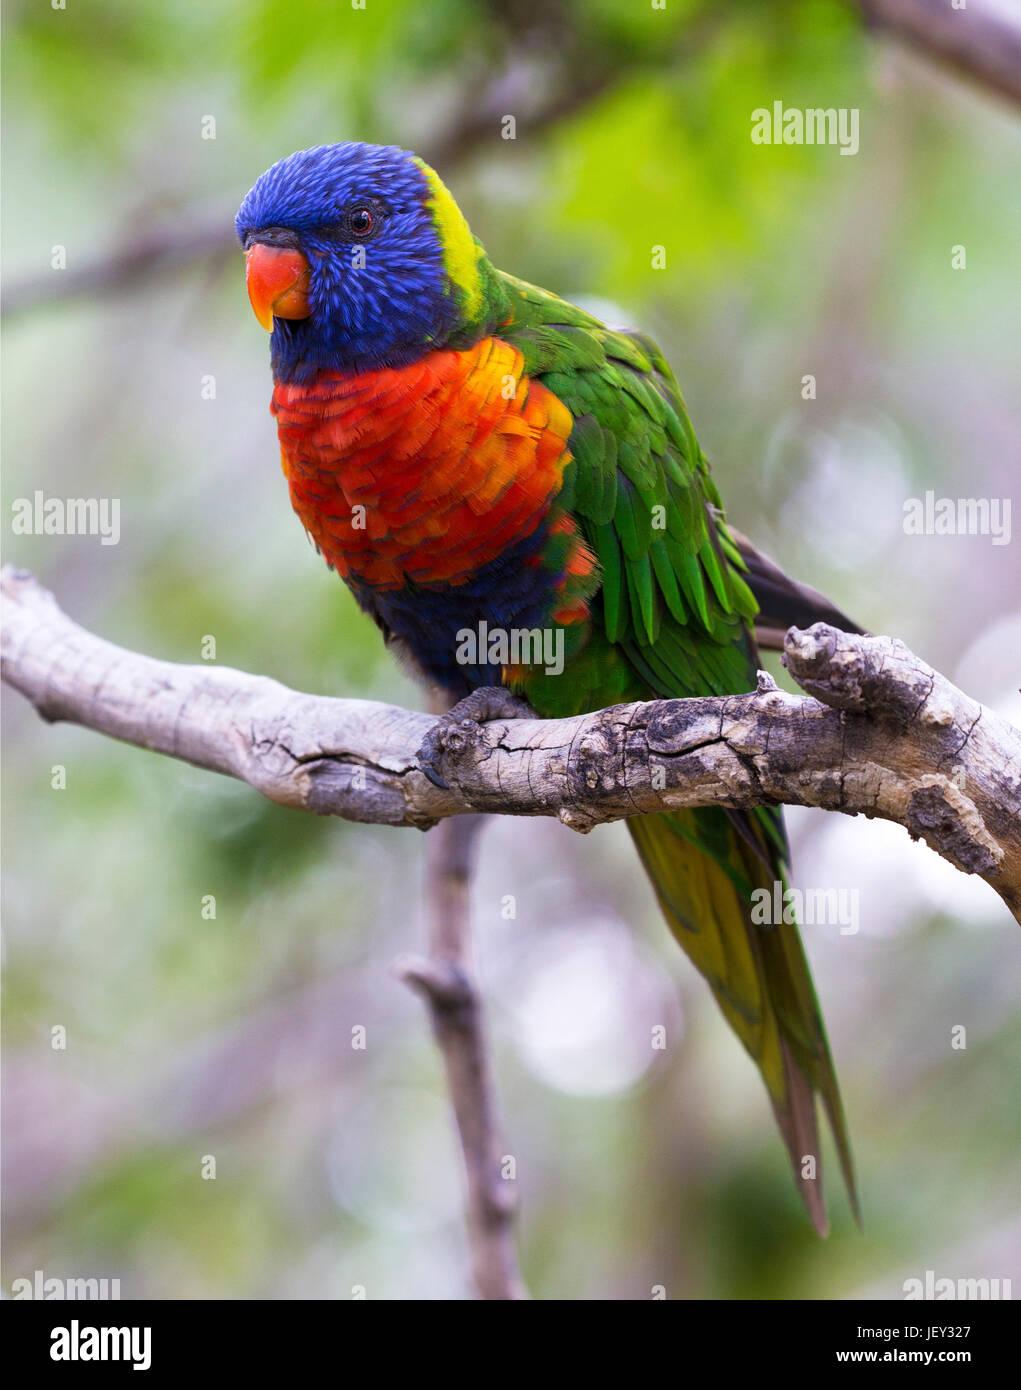 Retrato de Parrot - Rainbow Lorikeet Foto de stock